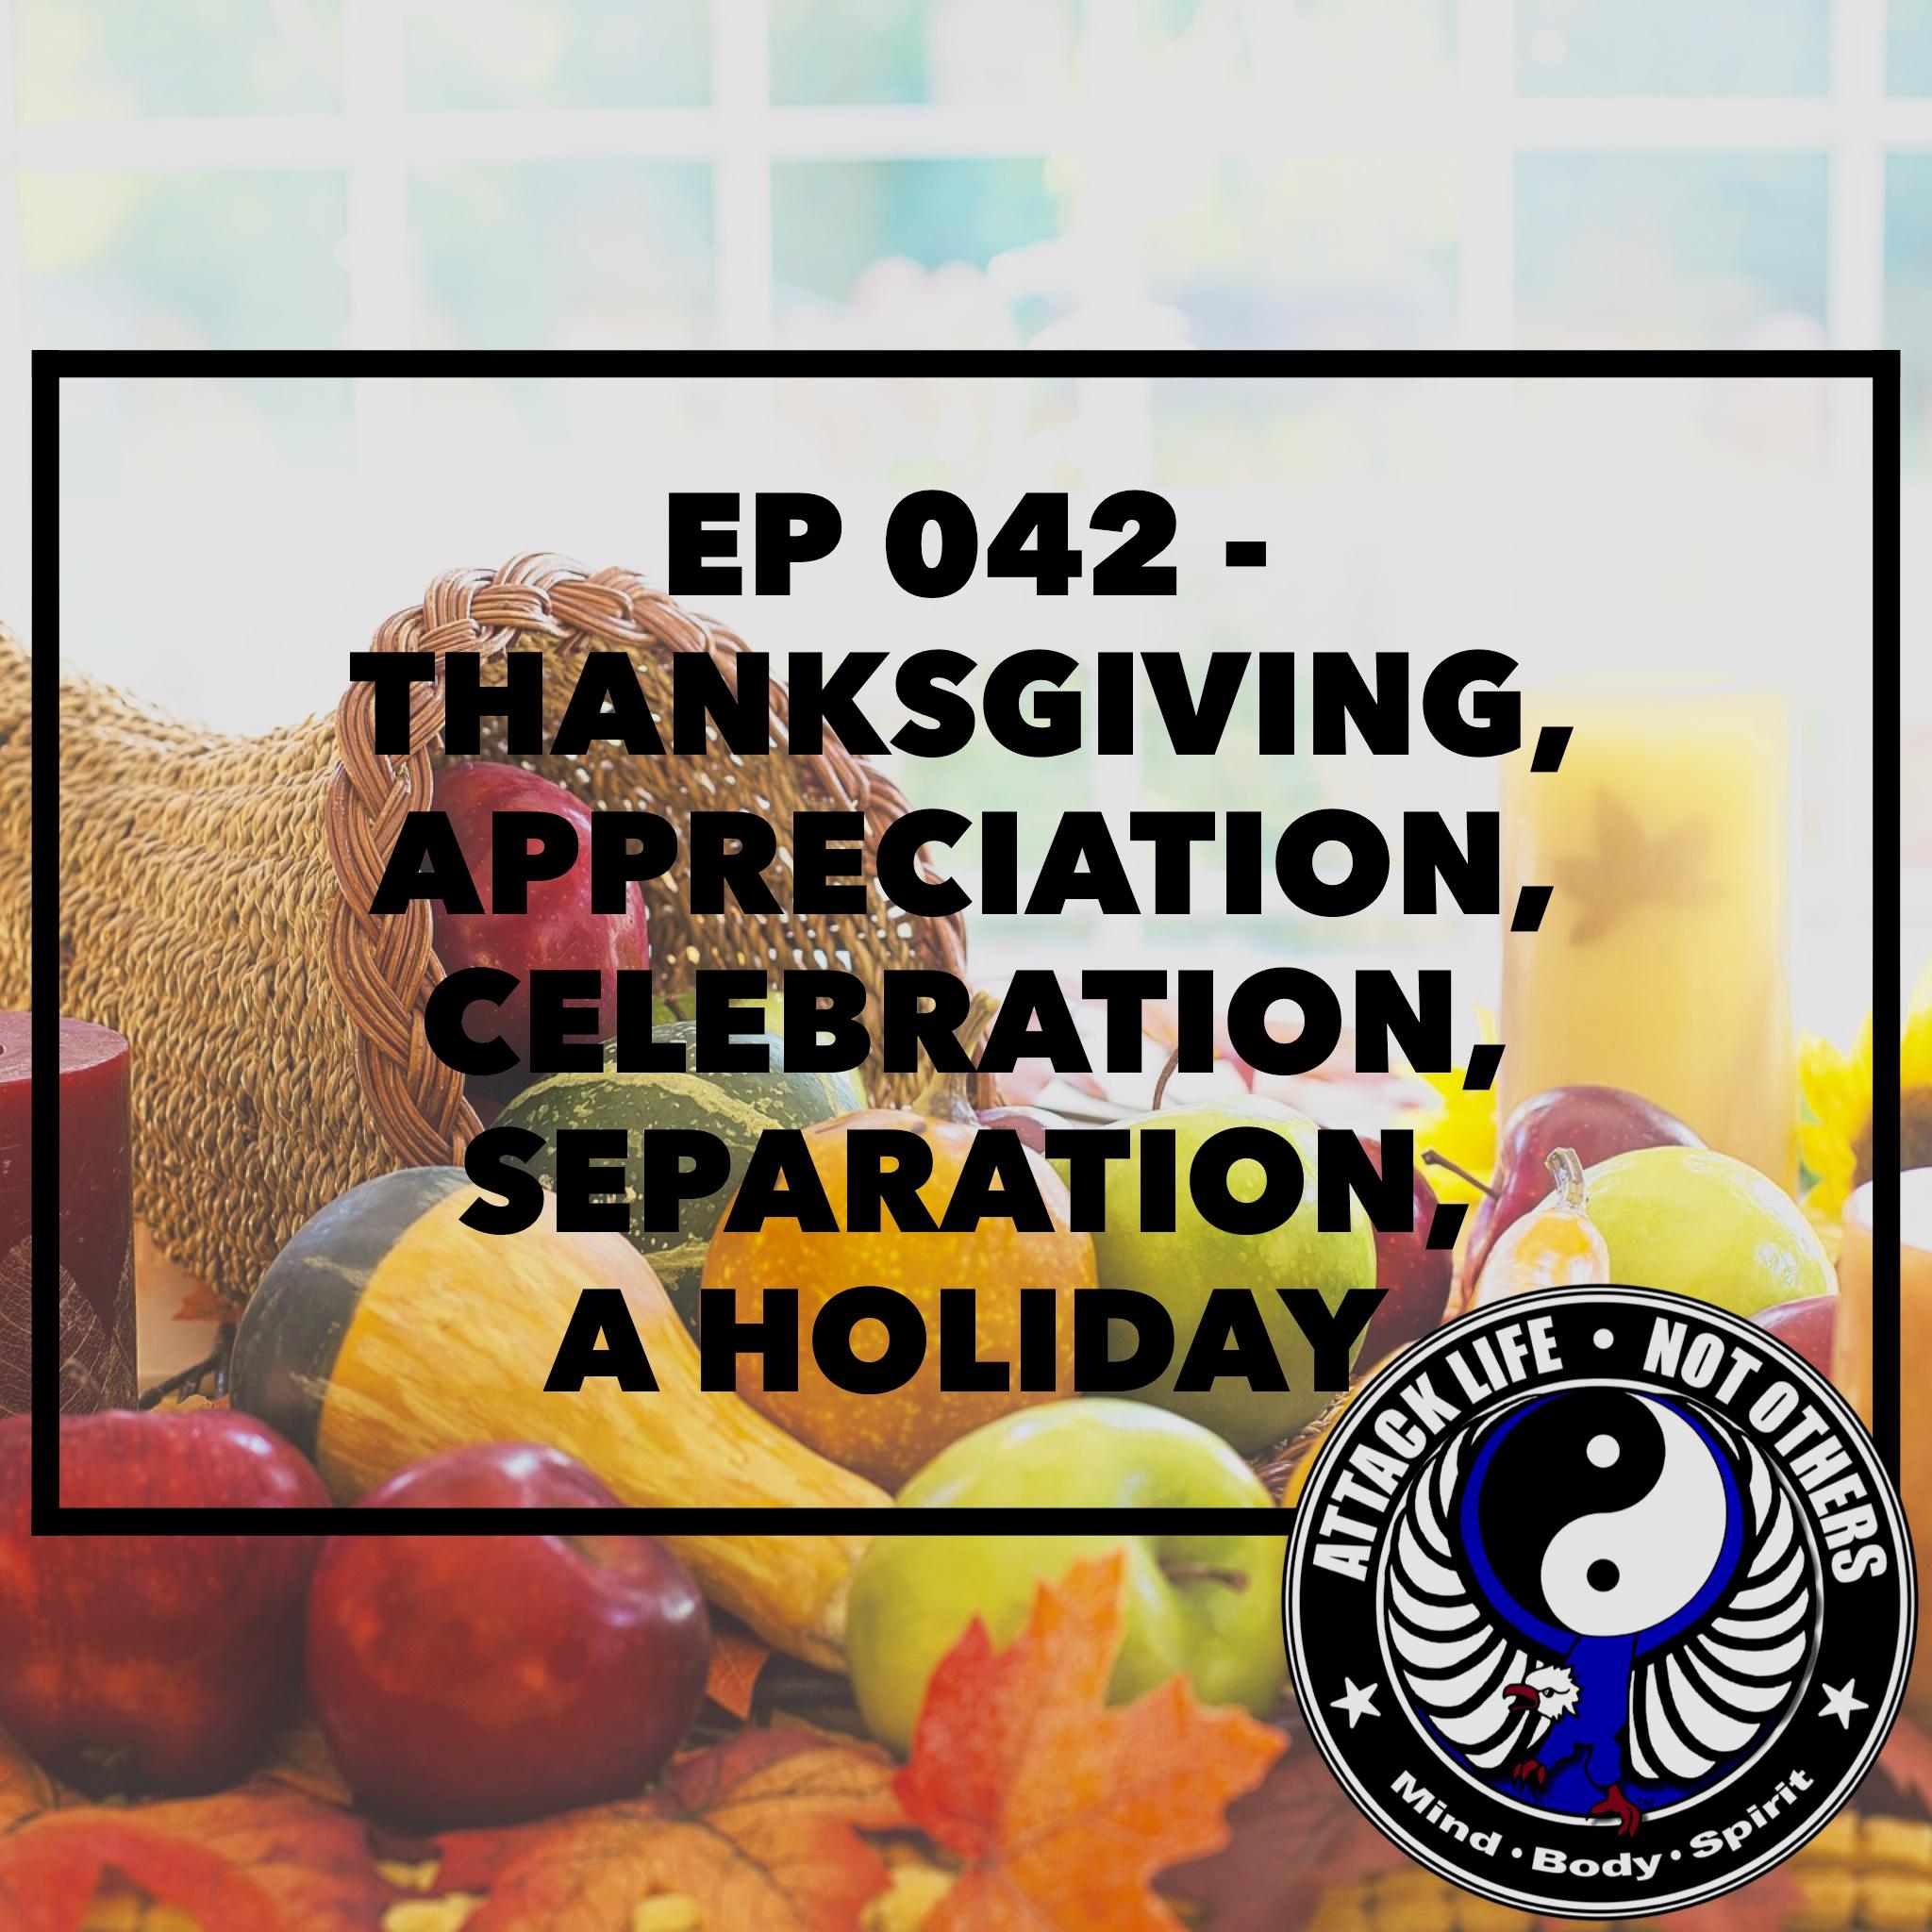 Artwork for Ep 042 - Thanksgiving - Appreciation, Celebration, Separation - A Holiday